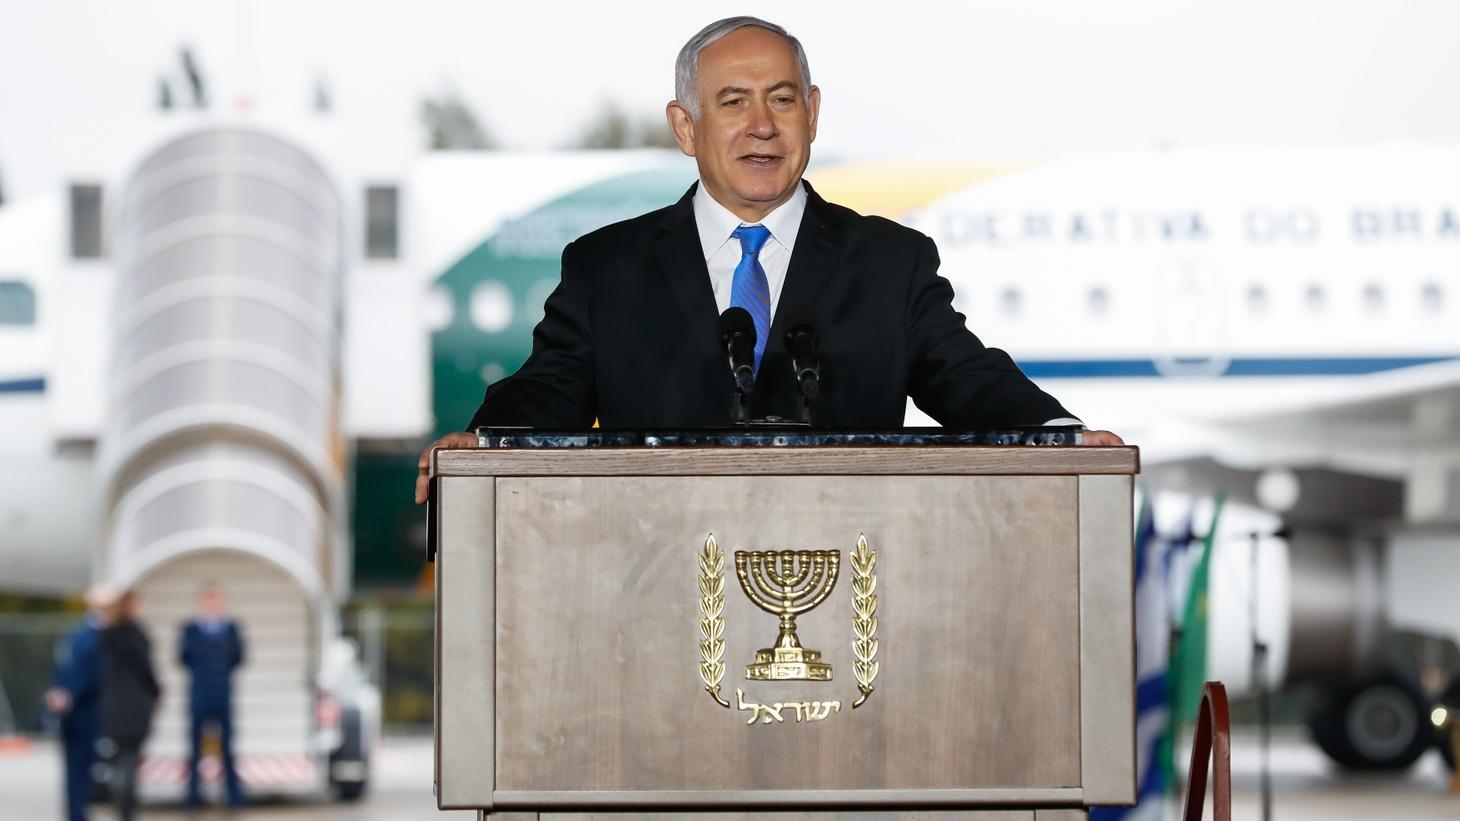 Benjamin Netanyahu in Tel Aviv, March 2019.